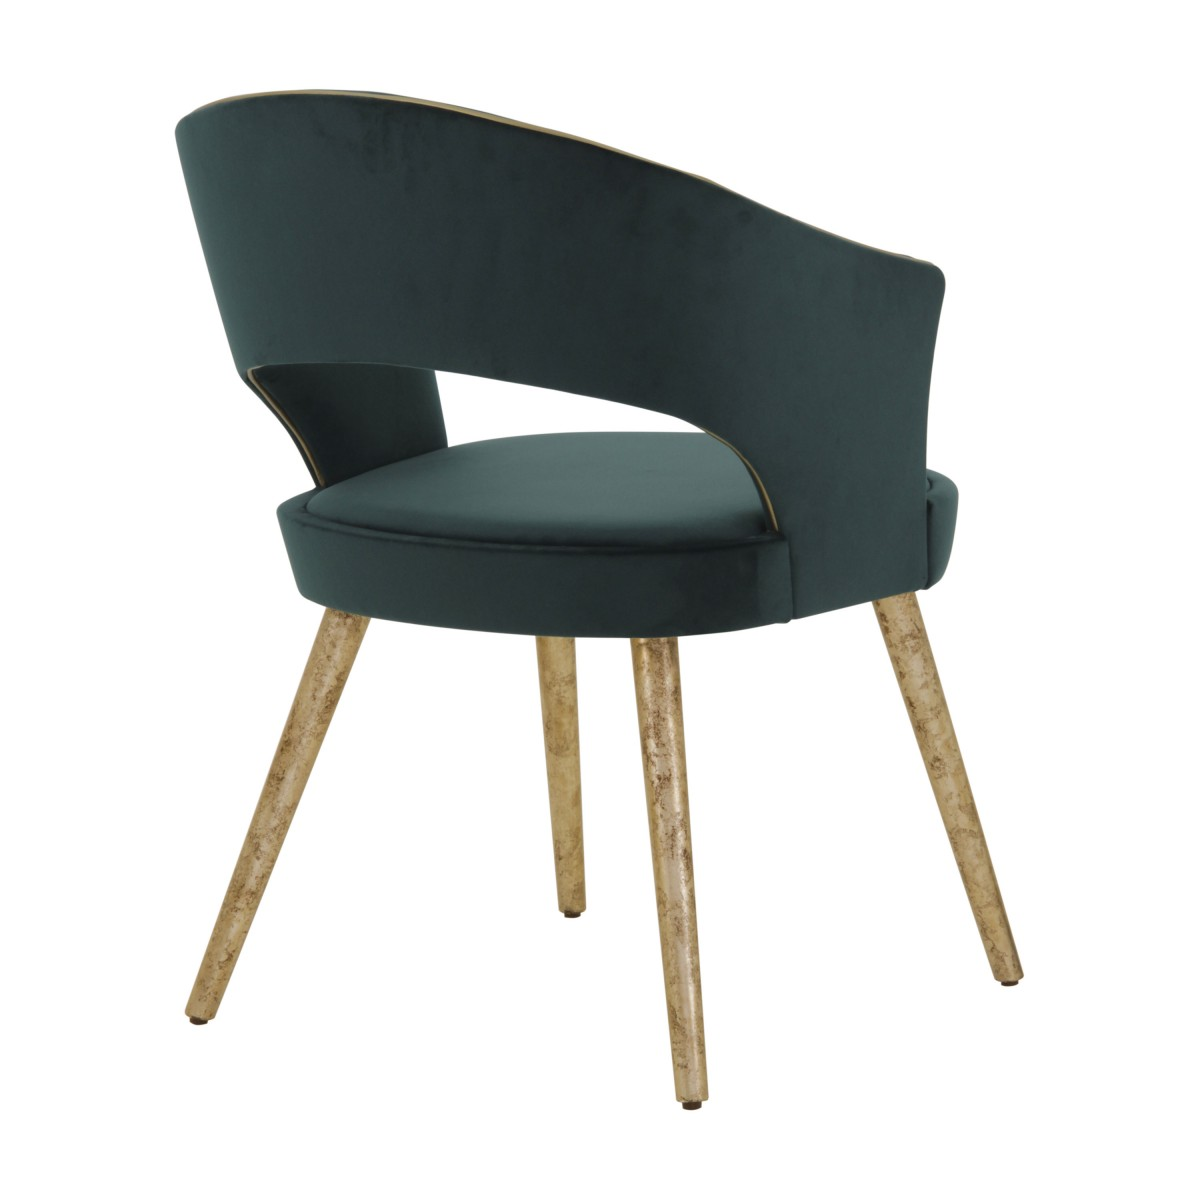 italian modern chair lucrezia 3 4942